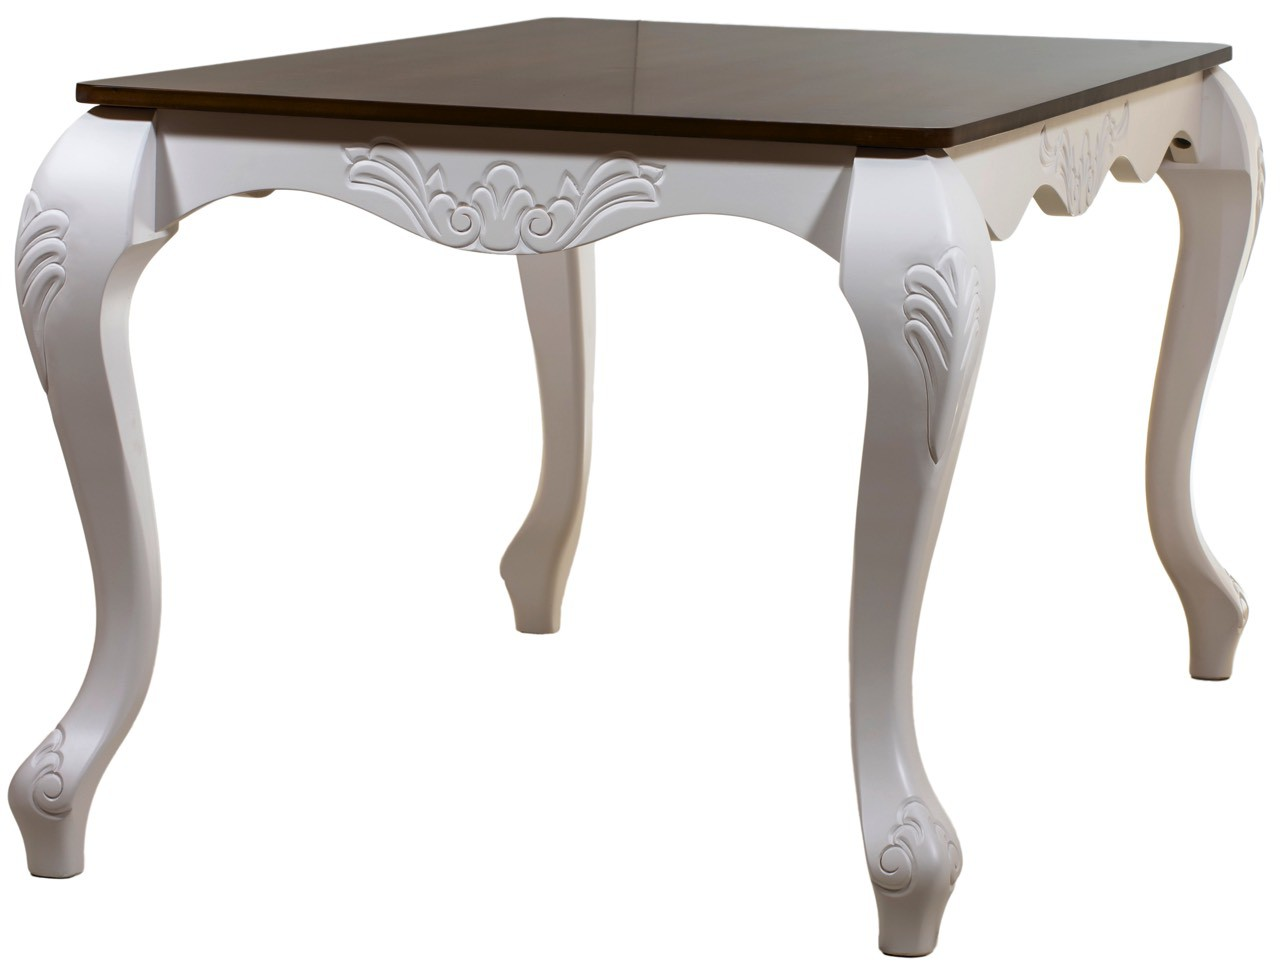 Mesa de Jantar Entalhada Imperatriz 8 Lugares Branca com Tampo Verniz + Cores